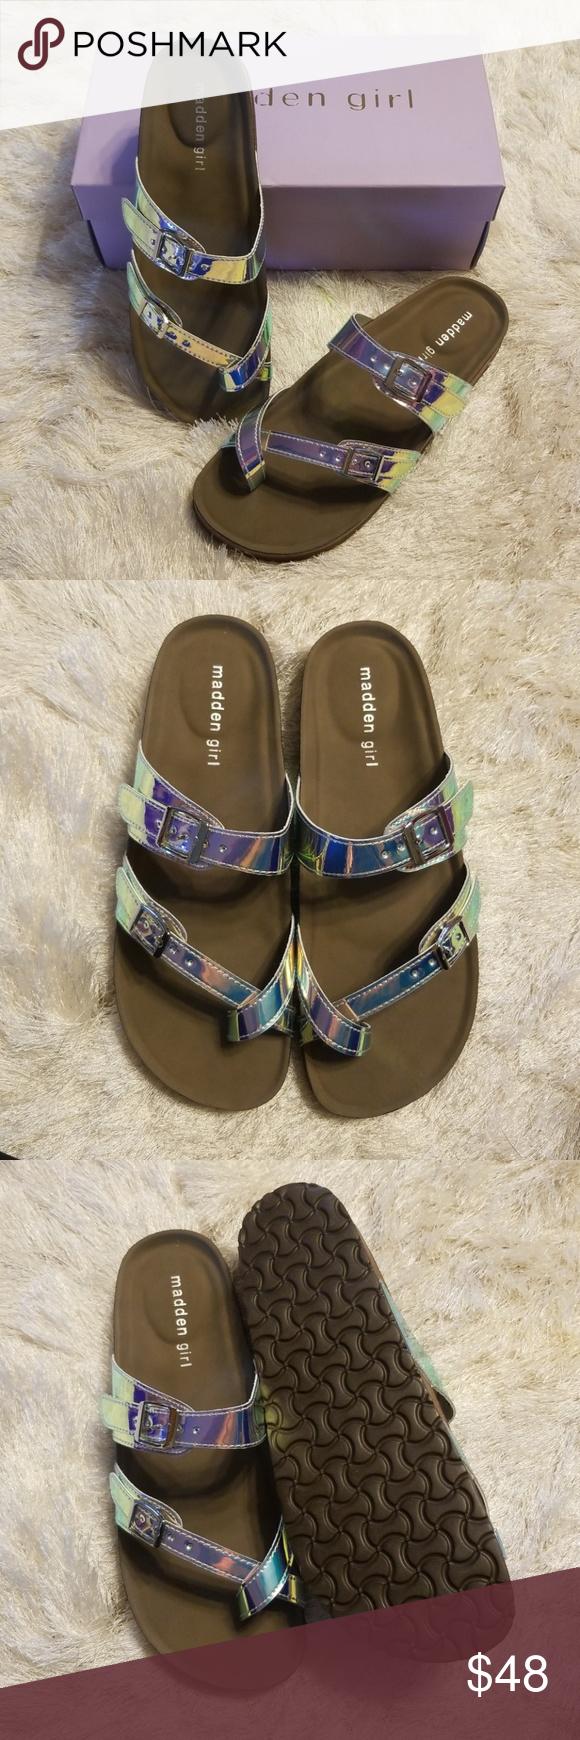 🧜🏼\u200d♀️ Steve Madden Mermaid Sandals